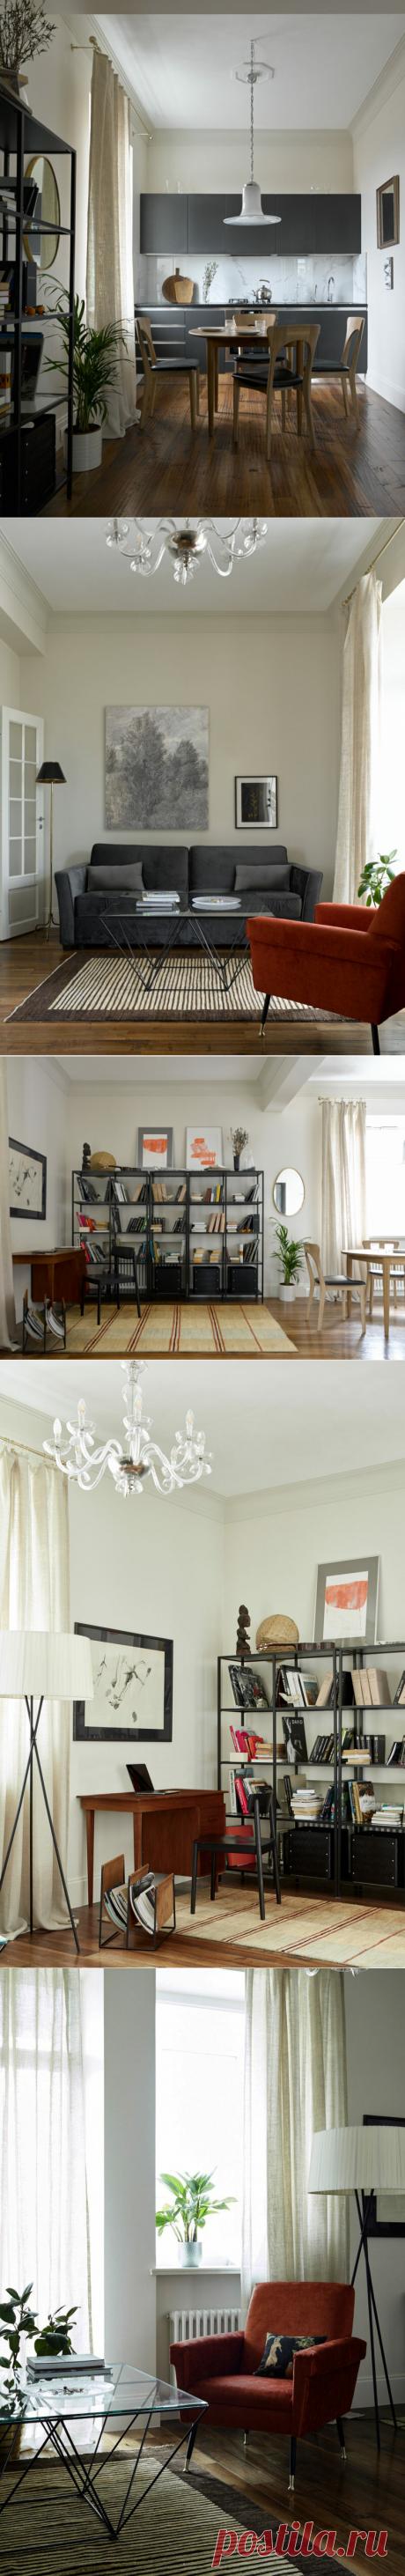 Уютная квартира с духом старины, 68 м² | AD Magazine Russia | Яндекс Дзен